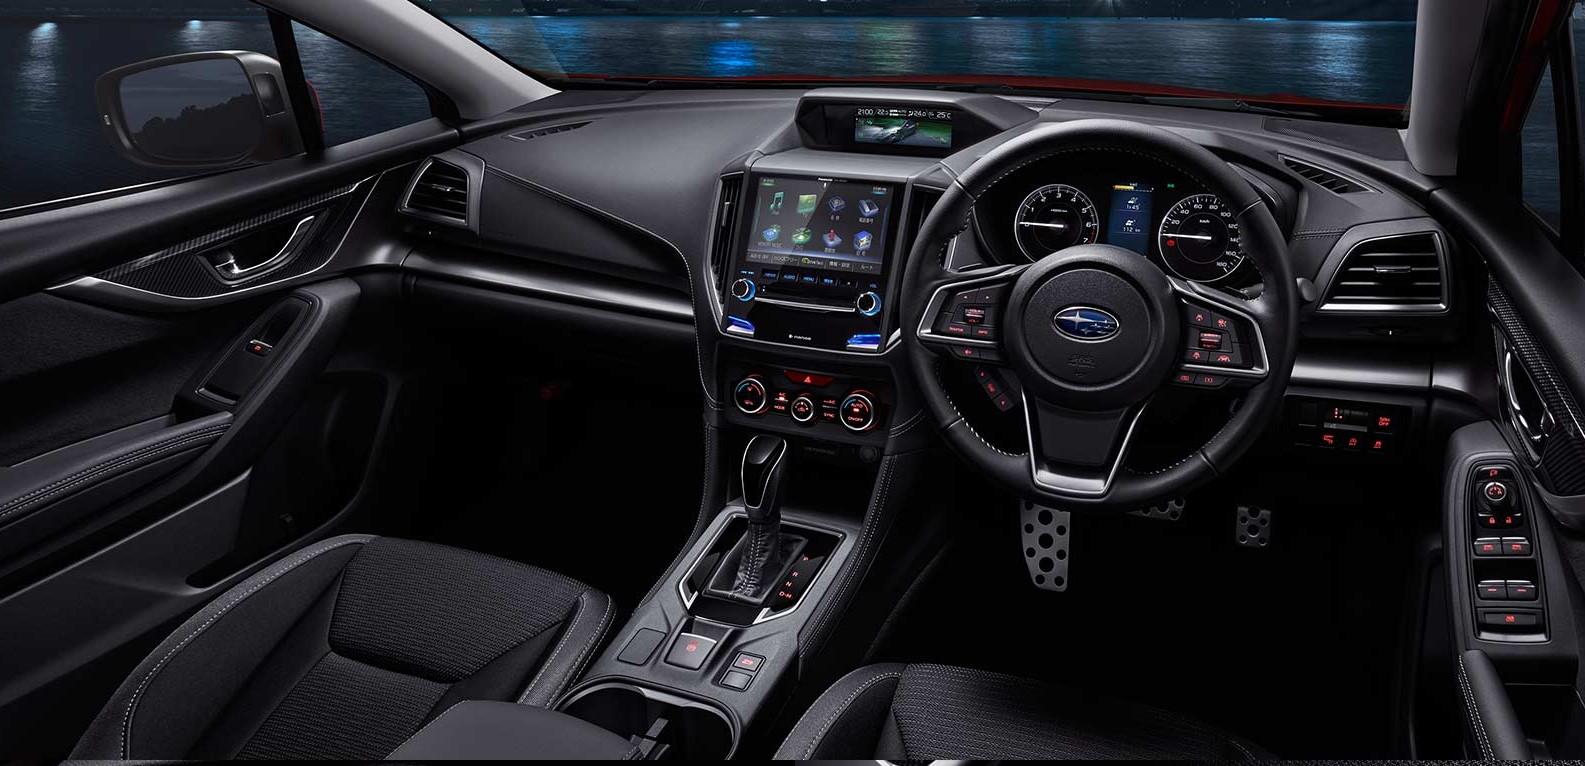 Leopaul S Blog Fifth Generation Subaru Impreza Gk Gt